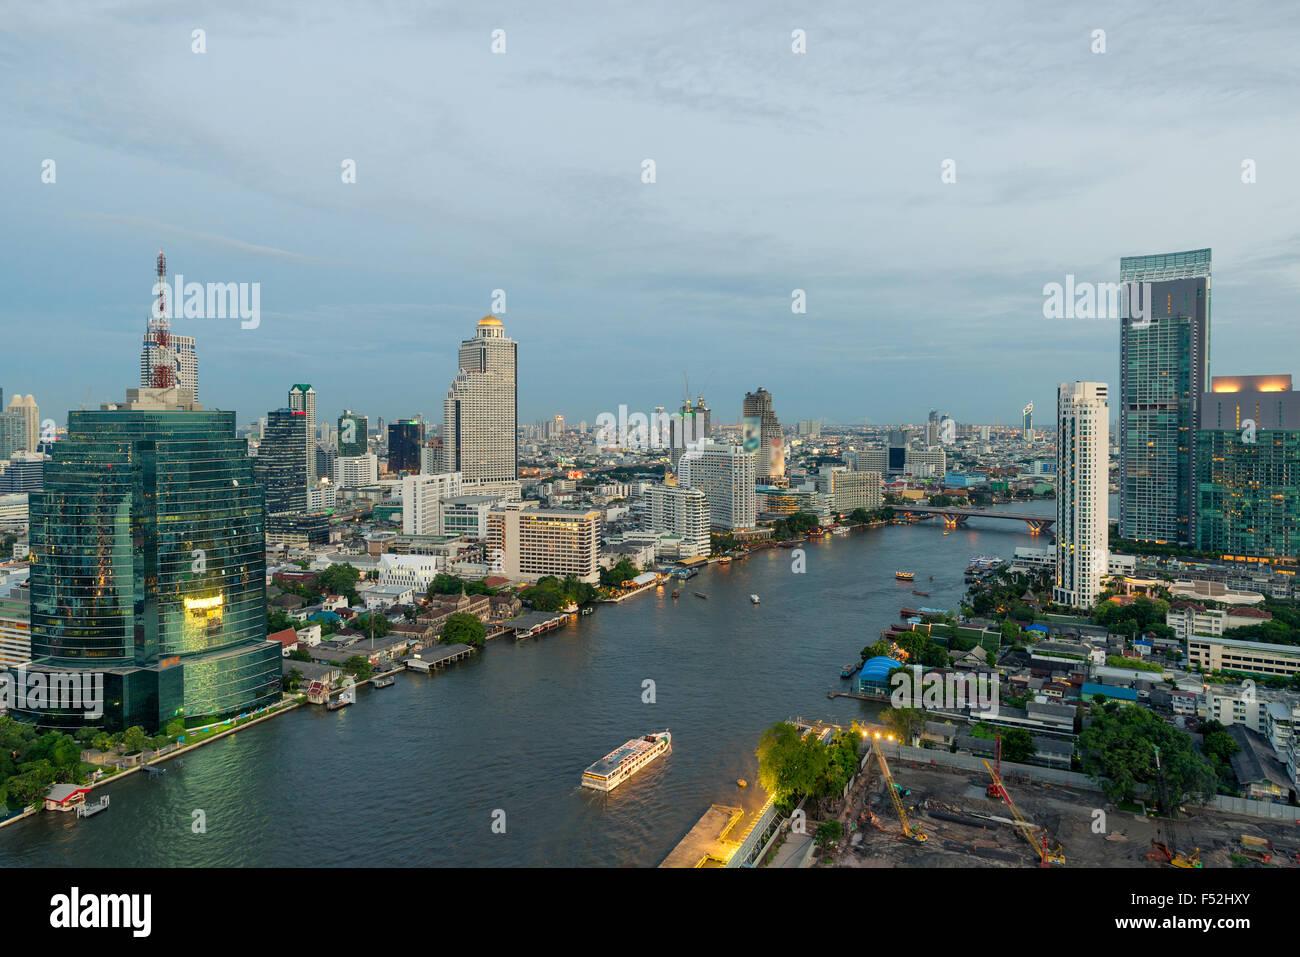 Bello Horizonte a lo largo del río Chao Phraya en Bangkok al anochecer , Tailandia Imagen De Stock